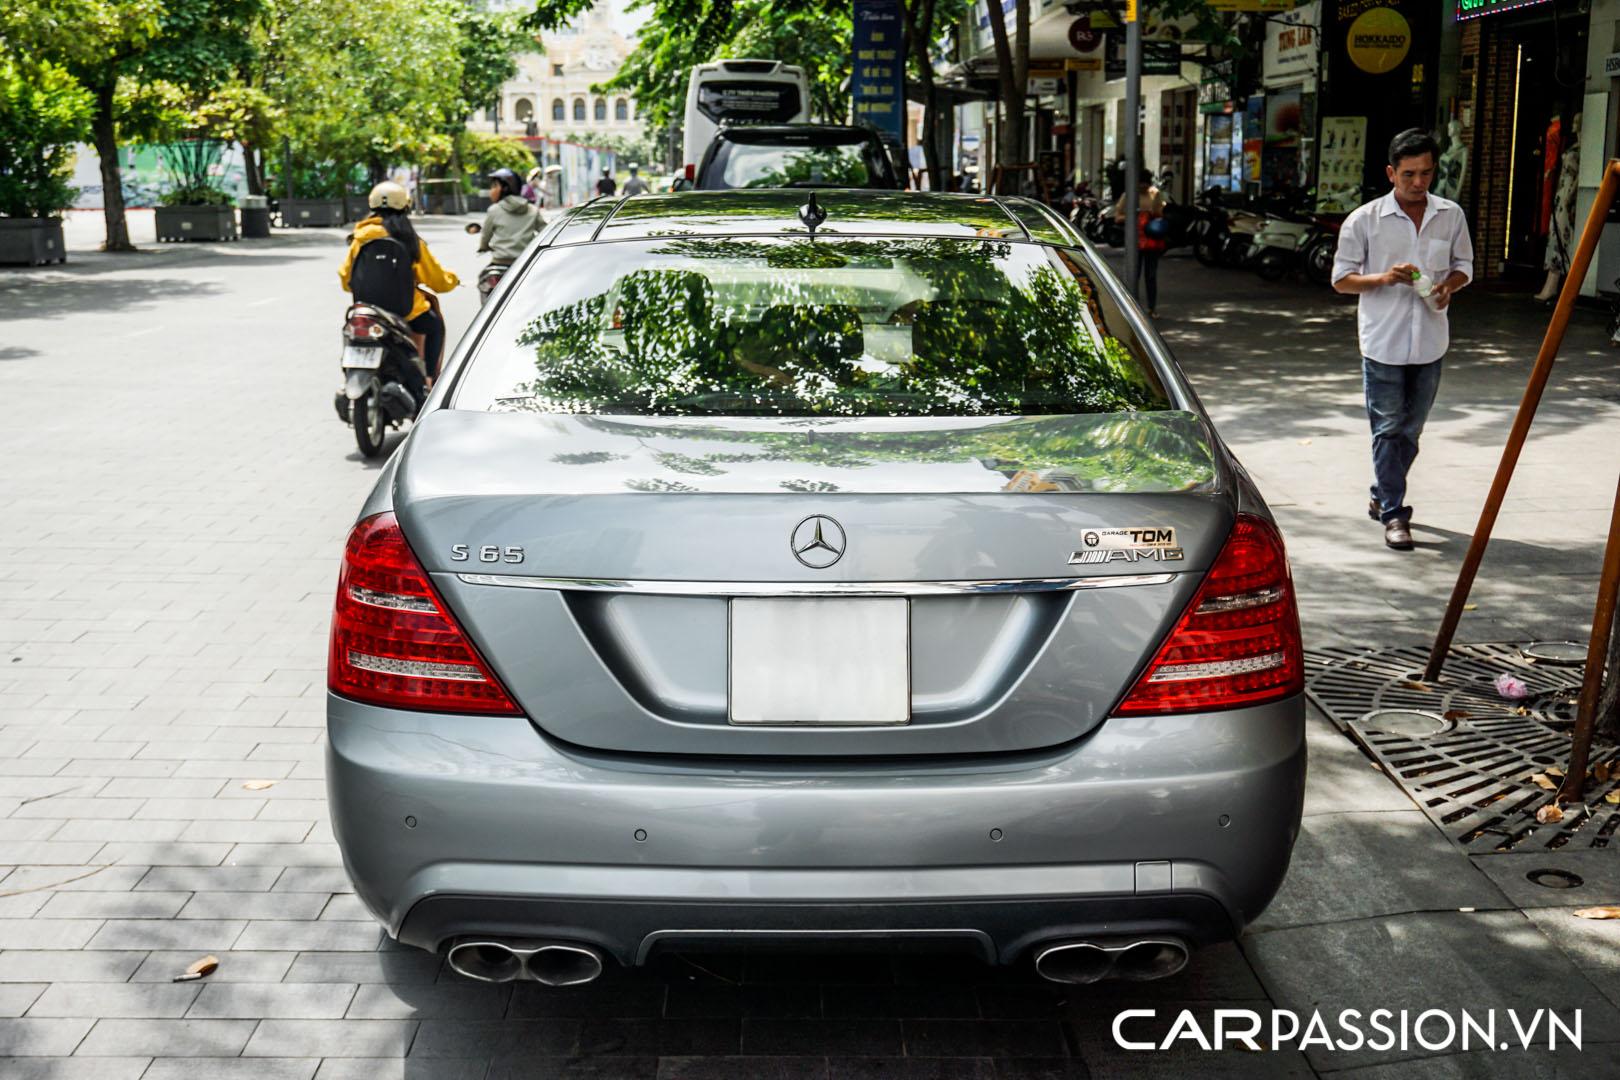 CP-Mercedes-Benz S65 AMG (3).jpg